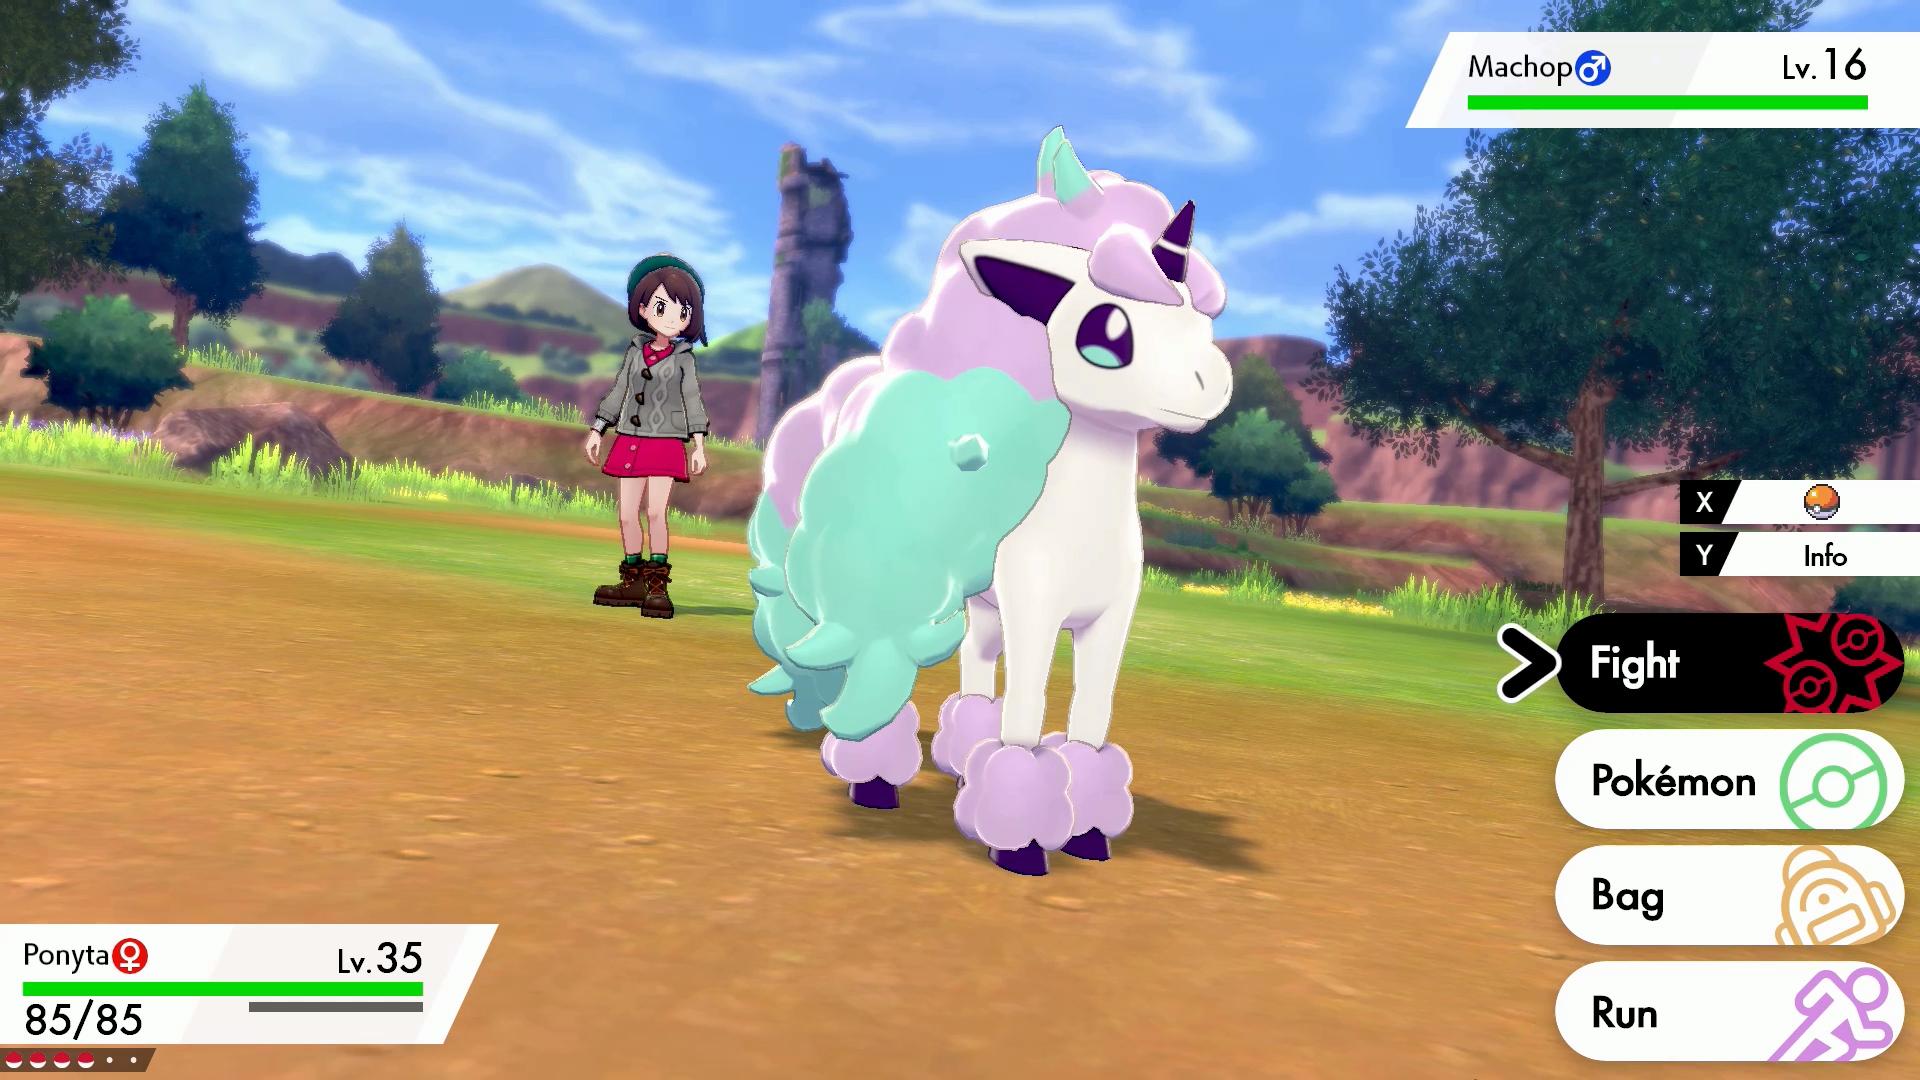 Best Nintendo Switch Games: Pokemon Sword and Shield